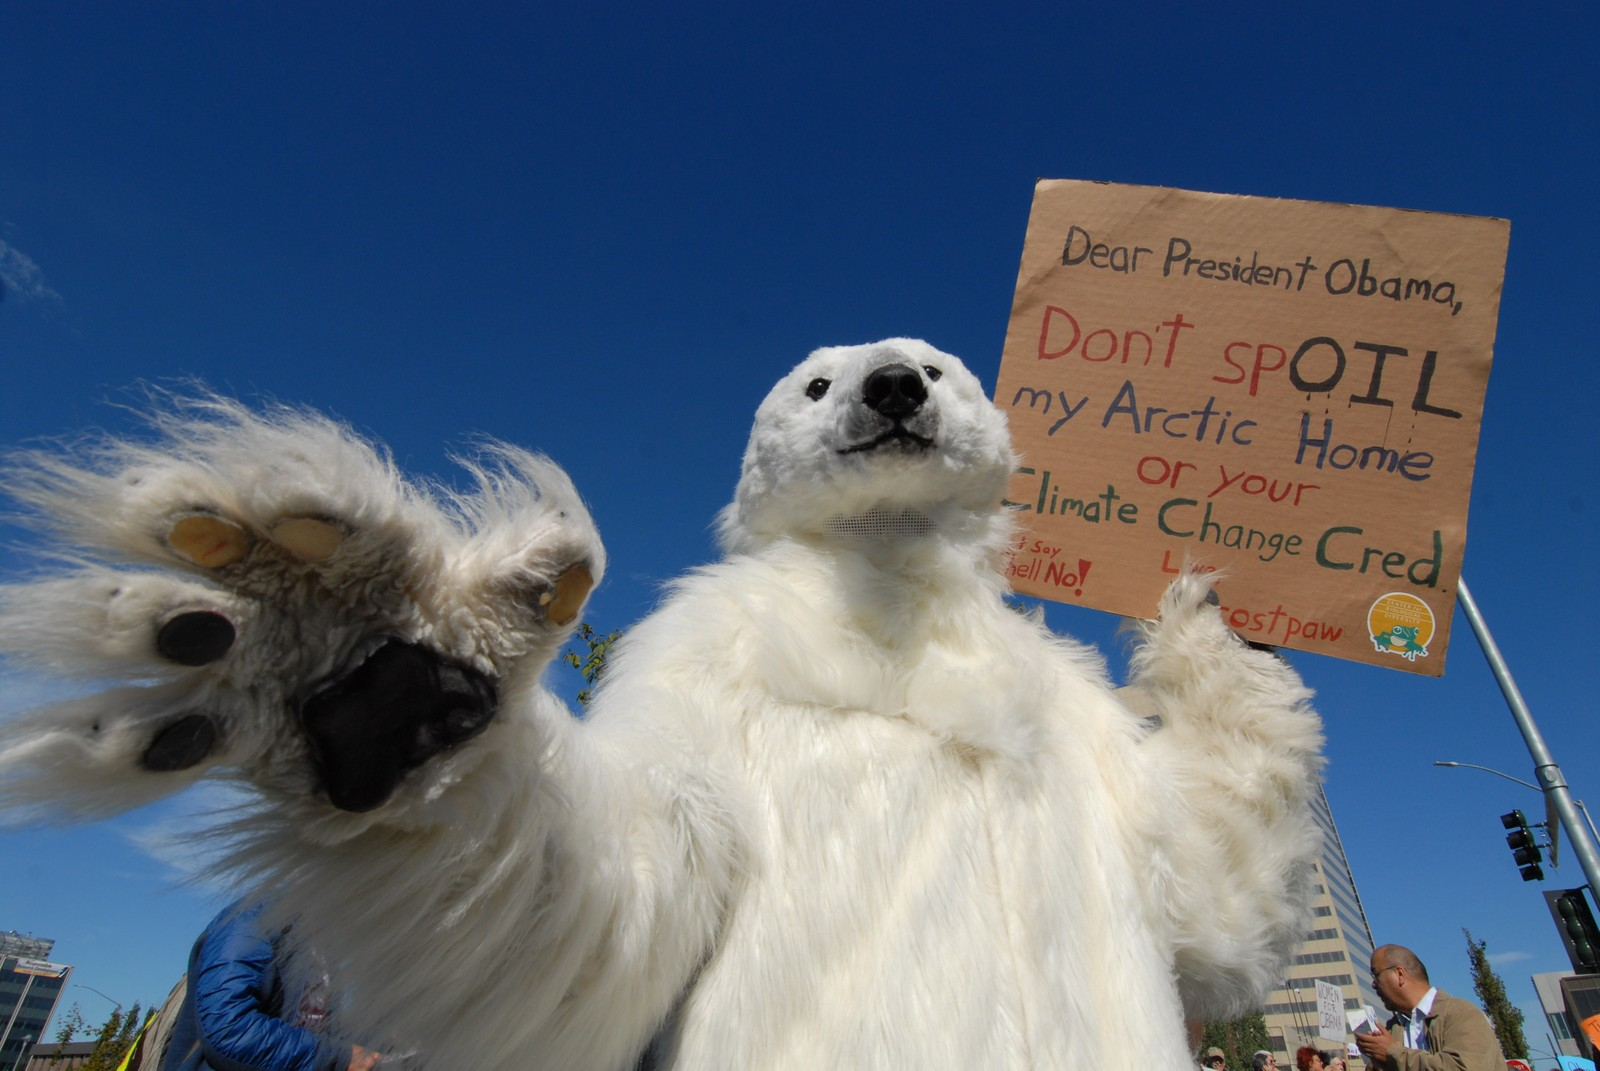 En isbjørn-utkledd demonstrant protesterte mot Shell samtidig som Obama ga en tale på en klimakonferanse i Anchorage, Alaska denne uka.